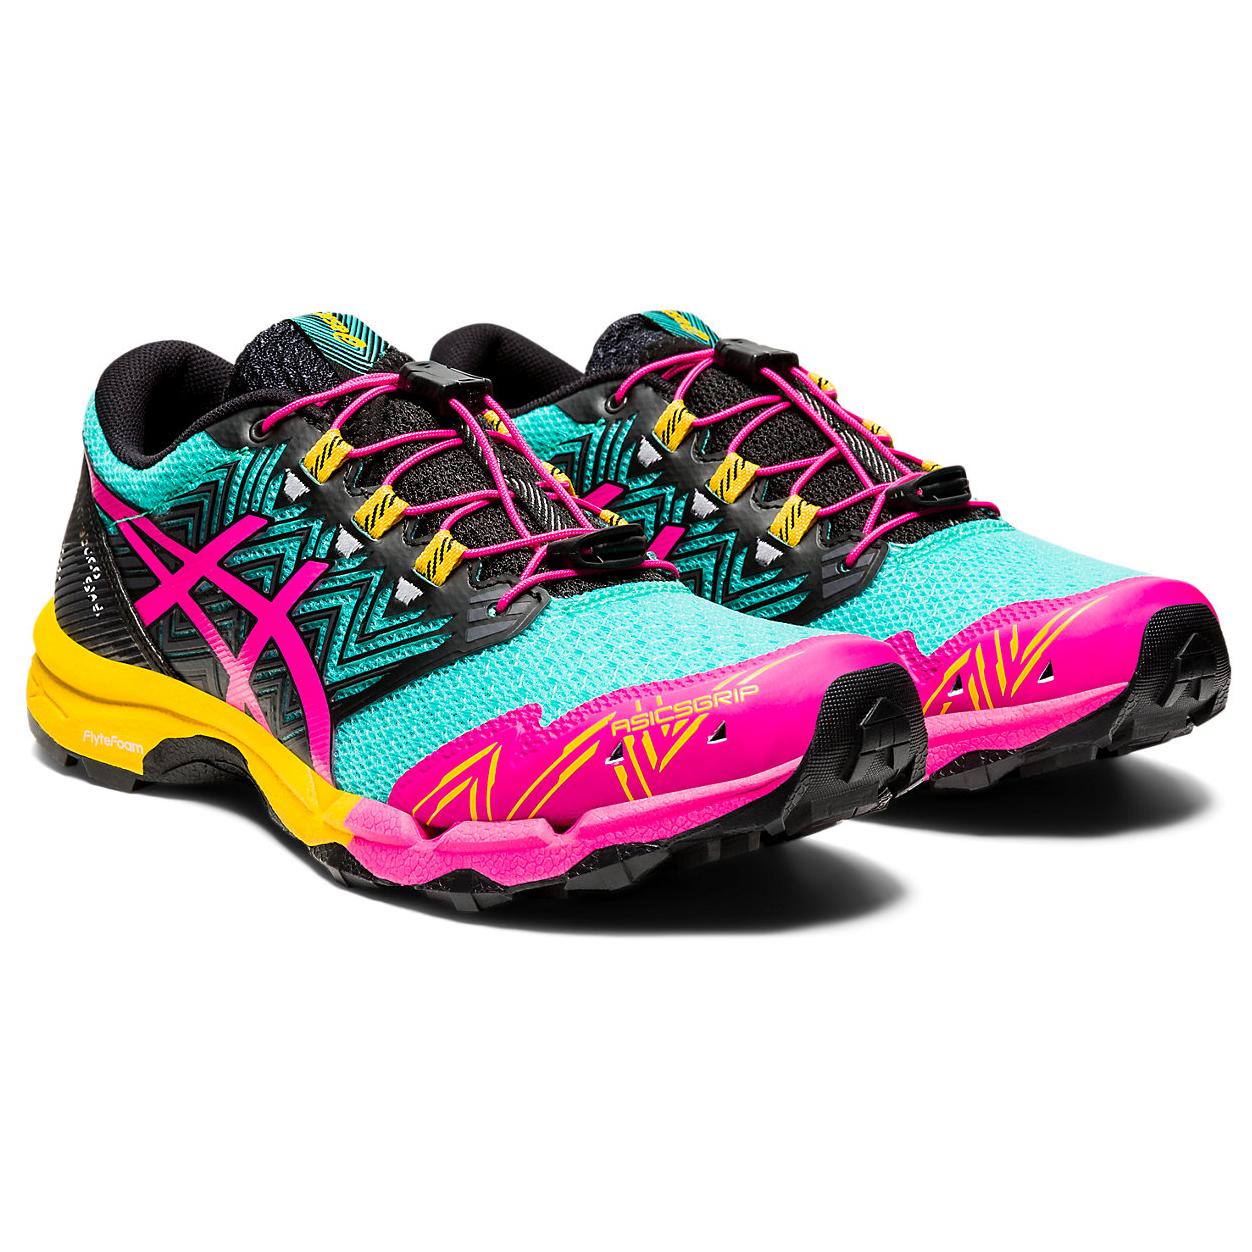 Asics - Women's Gel-Fujitrabuco Sky - Trail running shoes - Digital Grape / Baltic Jewel | 6 (US)